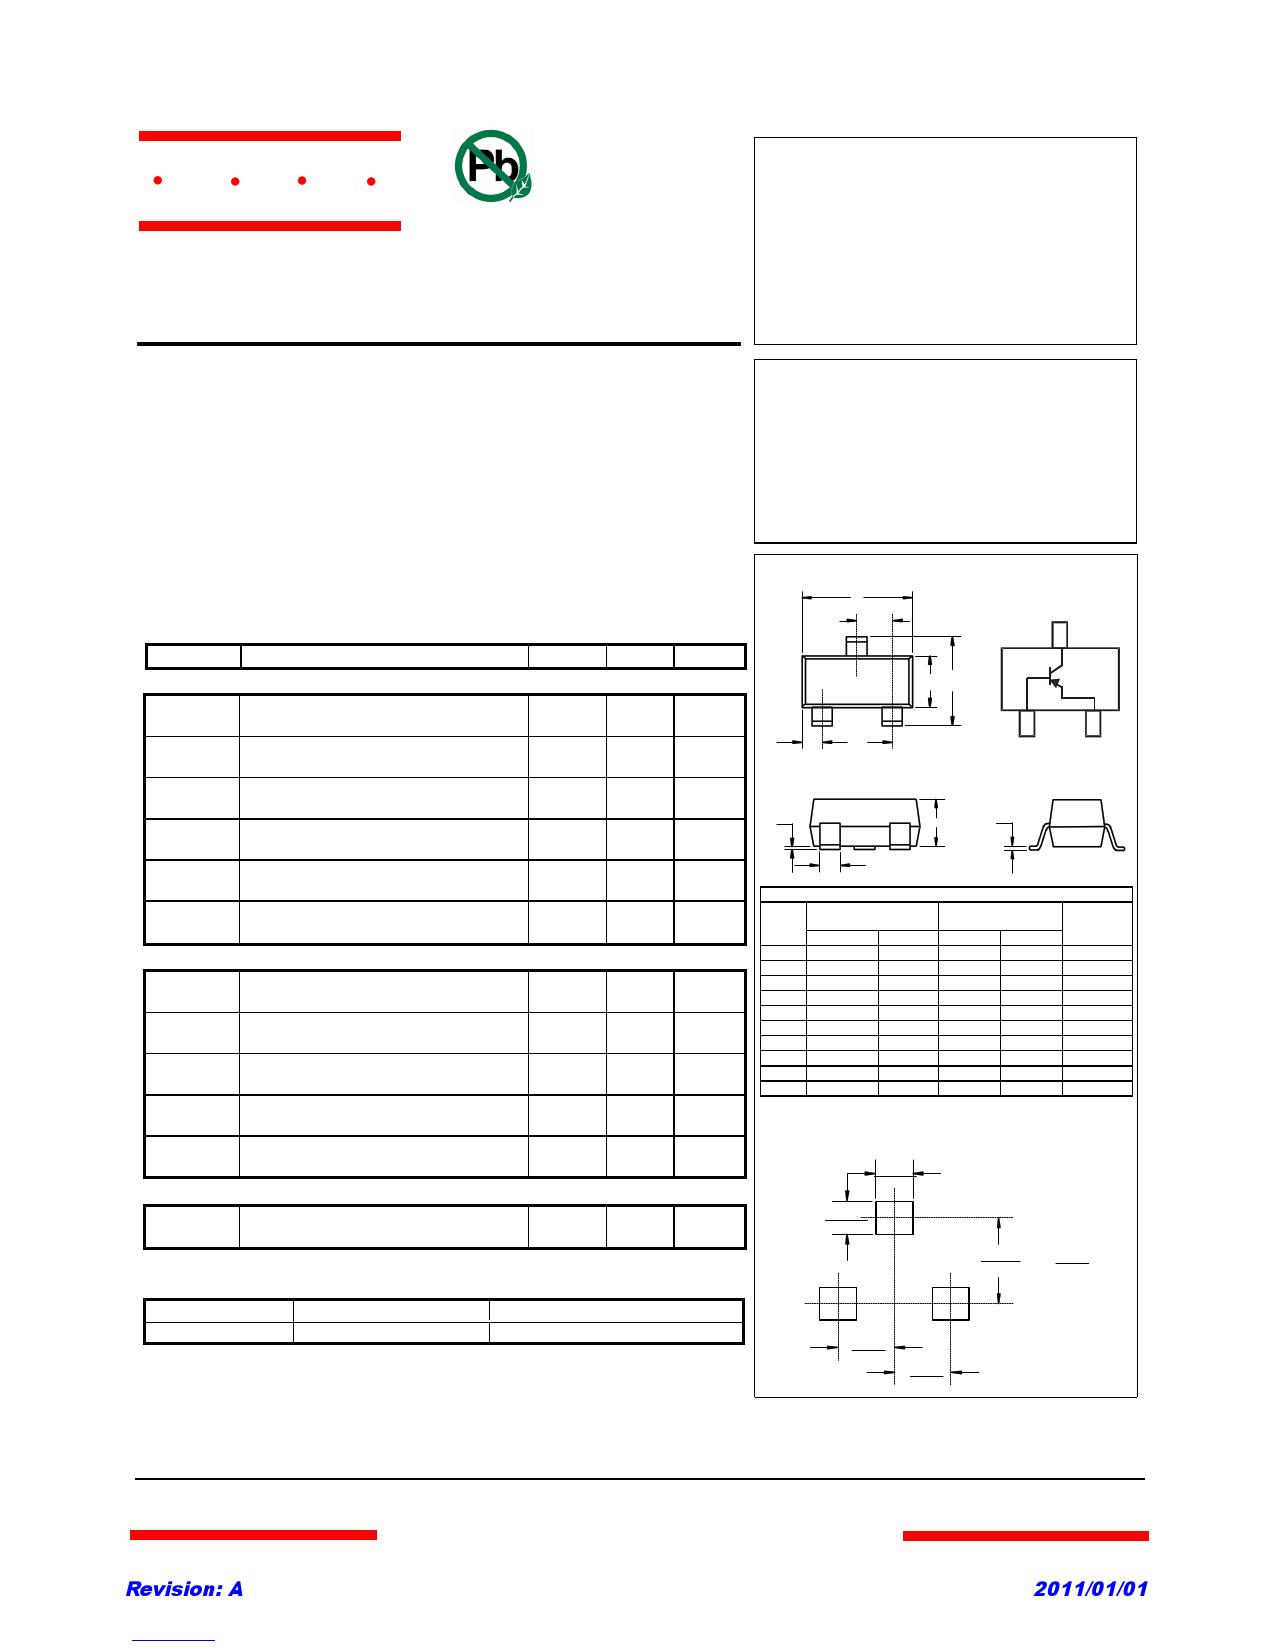 MMS9012-L datasheet